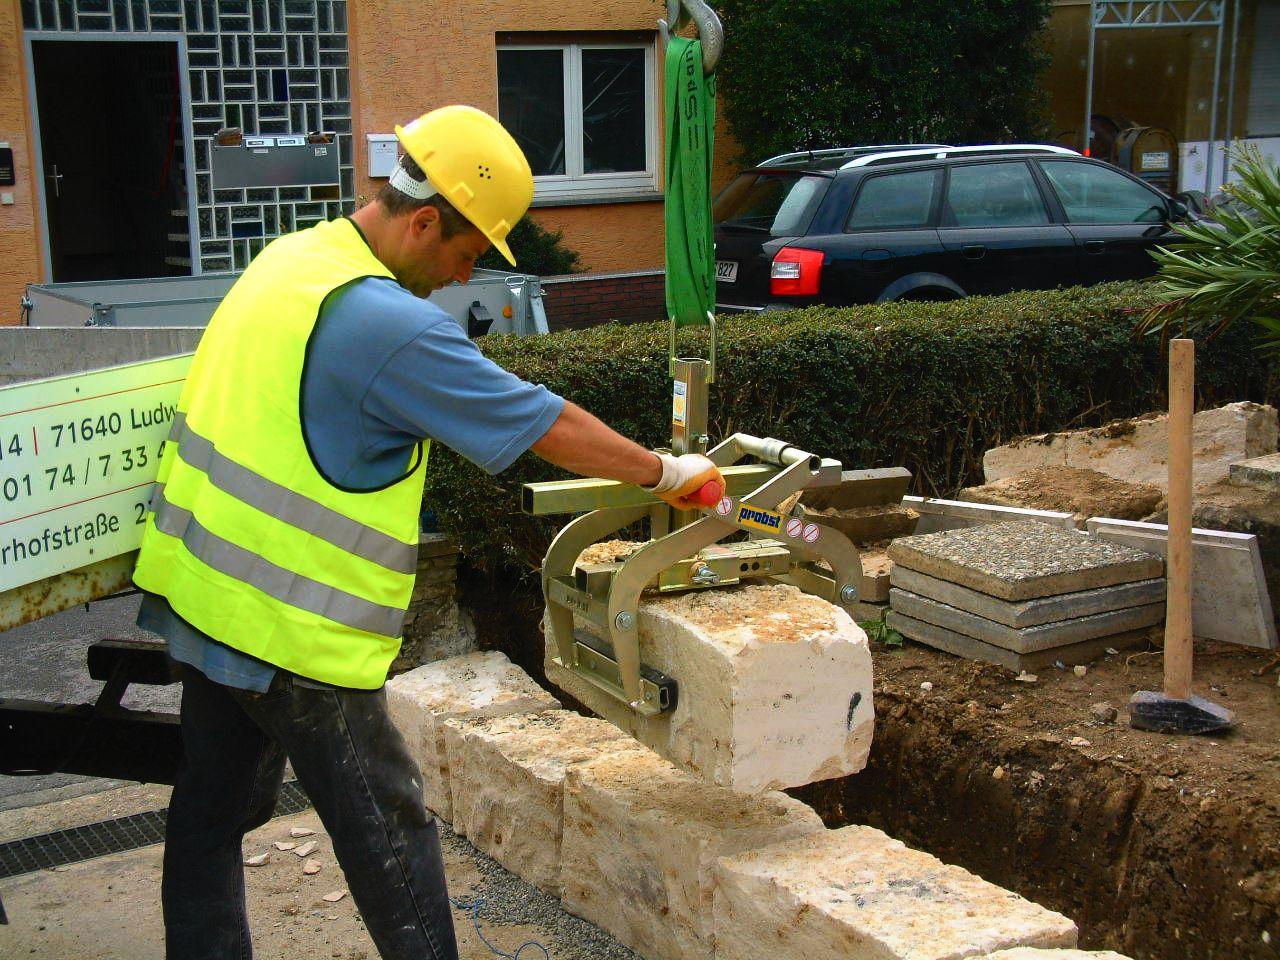 Probst TSZ Concrete Step Handles 600Kg SWL